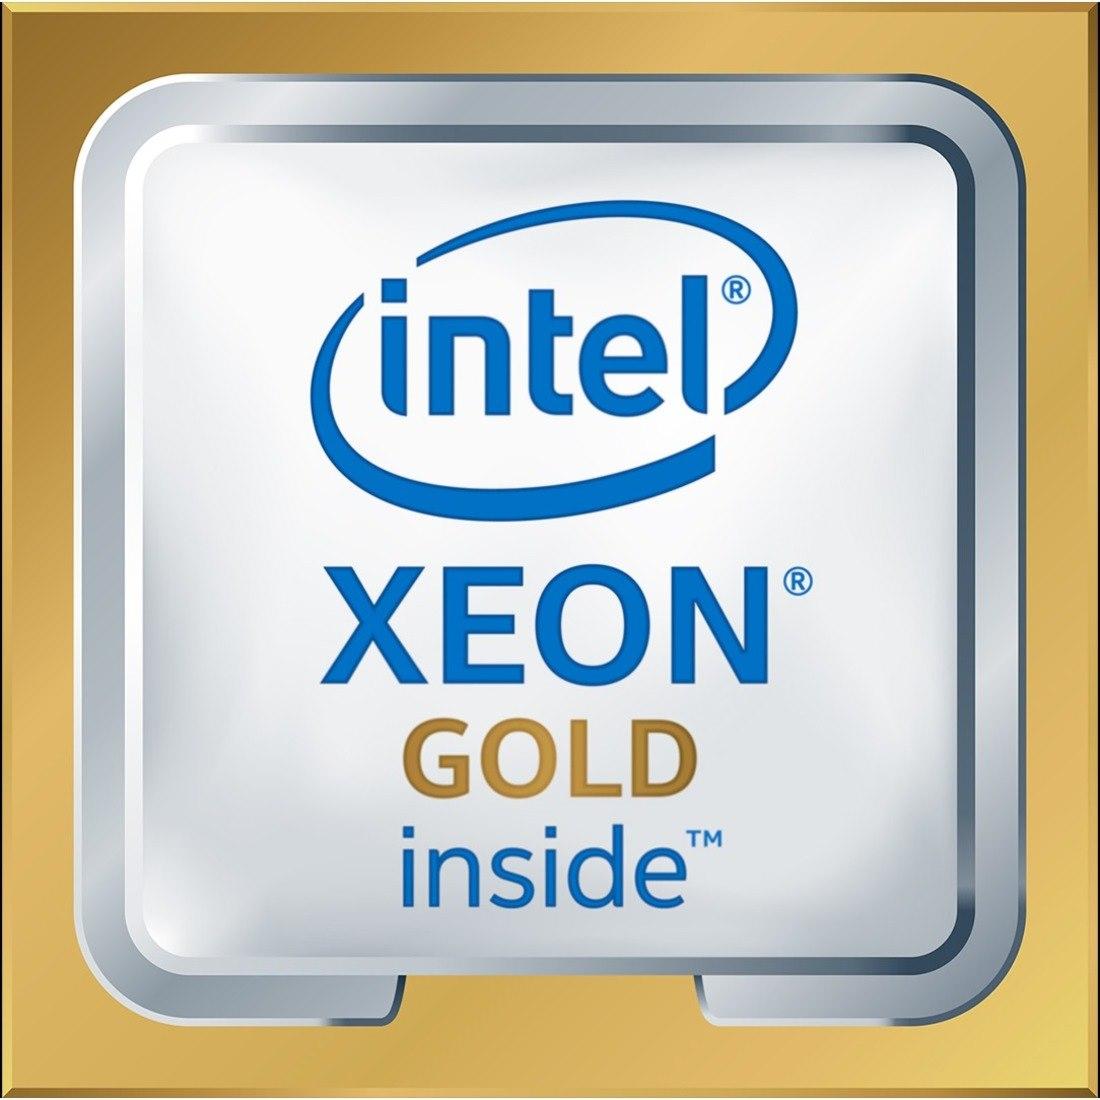 Intel Xeon 6134 Octa-core (8 Core) 3.20 GHz Processor - Retail Pack